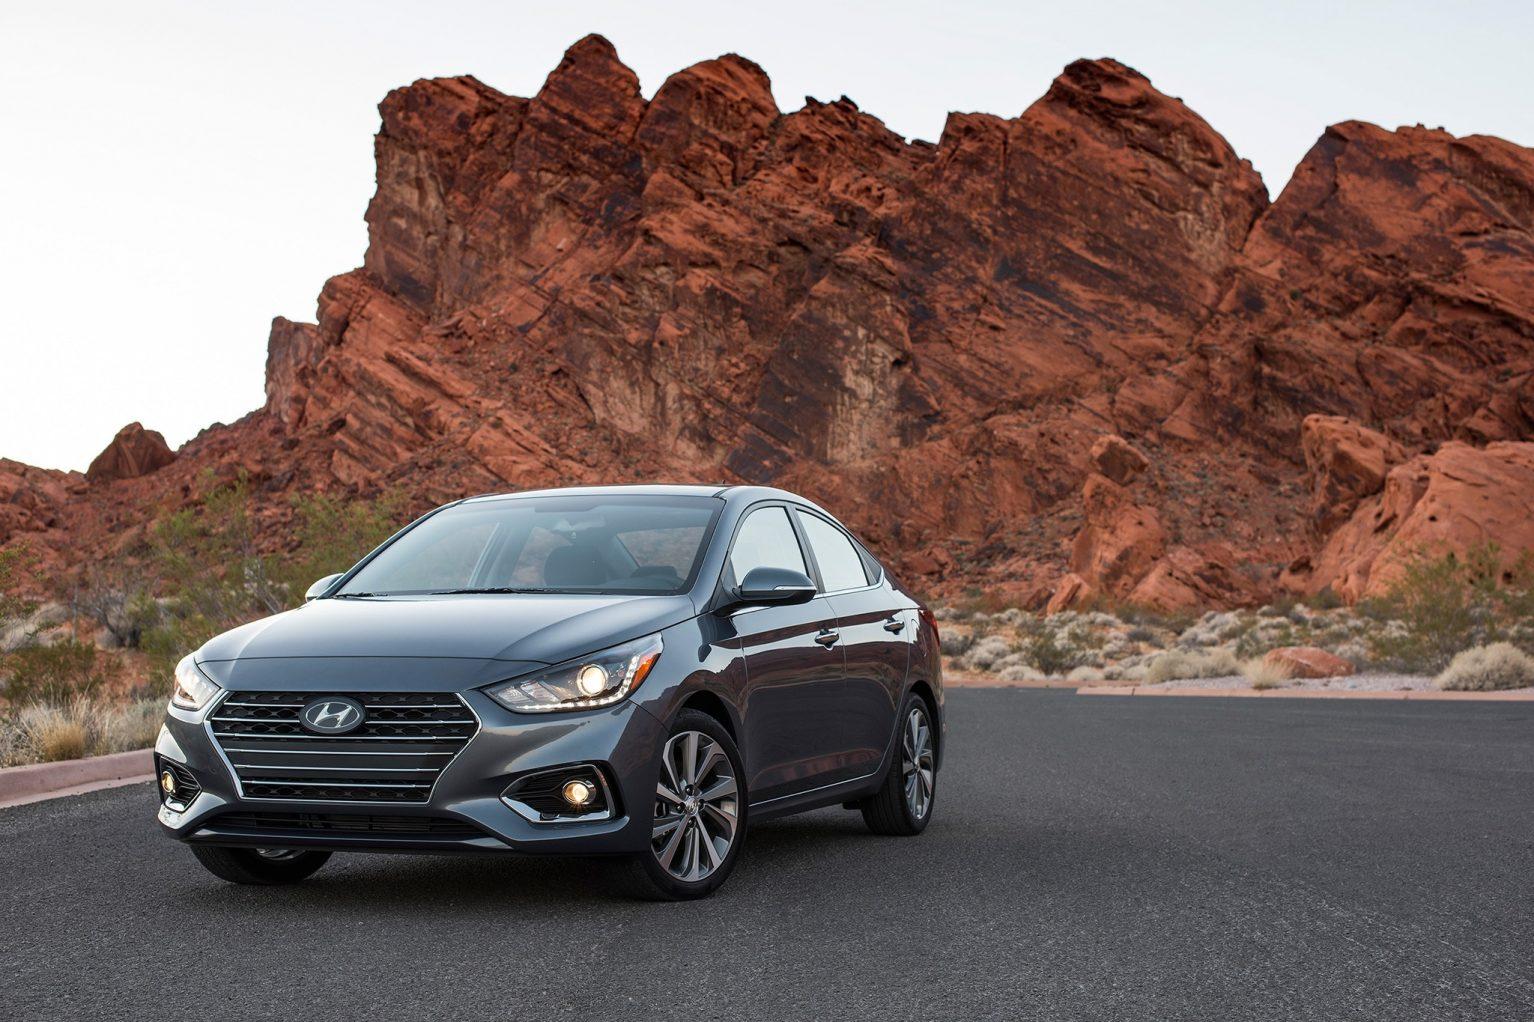 2019 Hyundai Accent New Design Wallpapers Autoweikcom 1534x1022